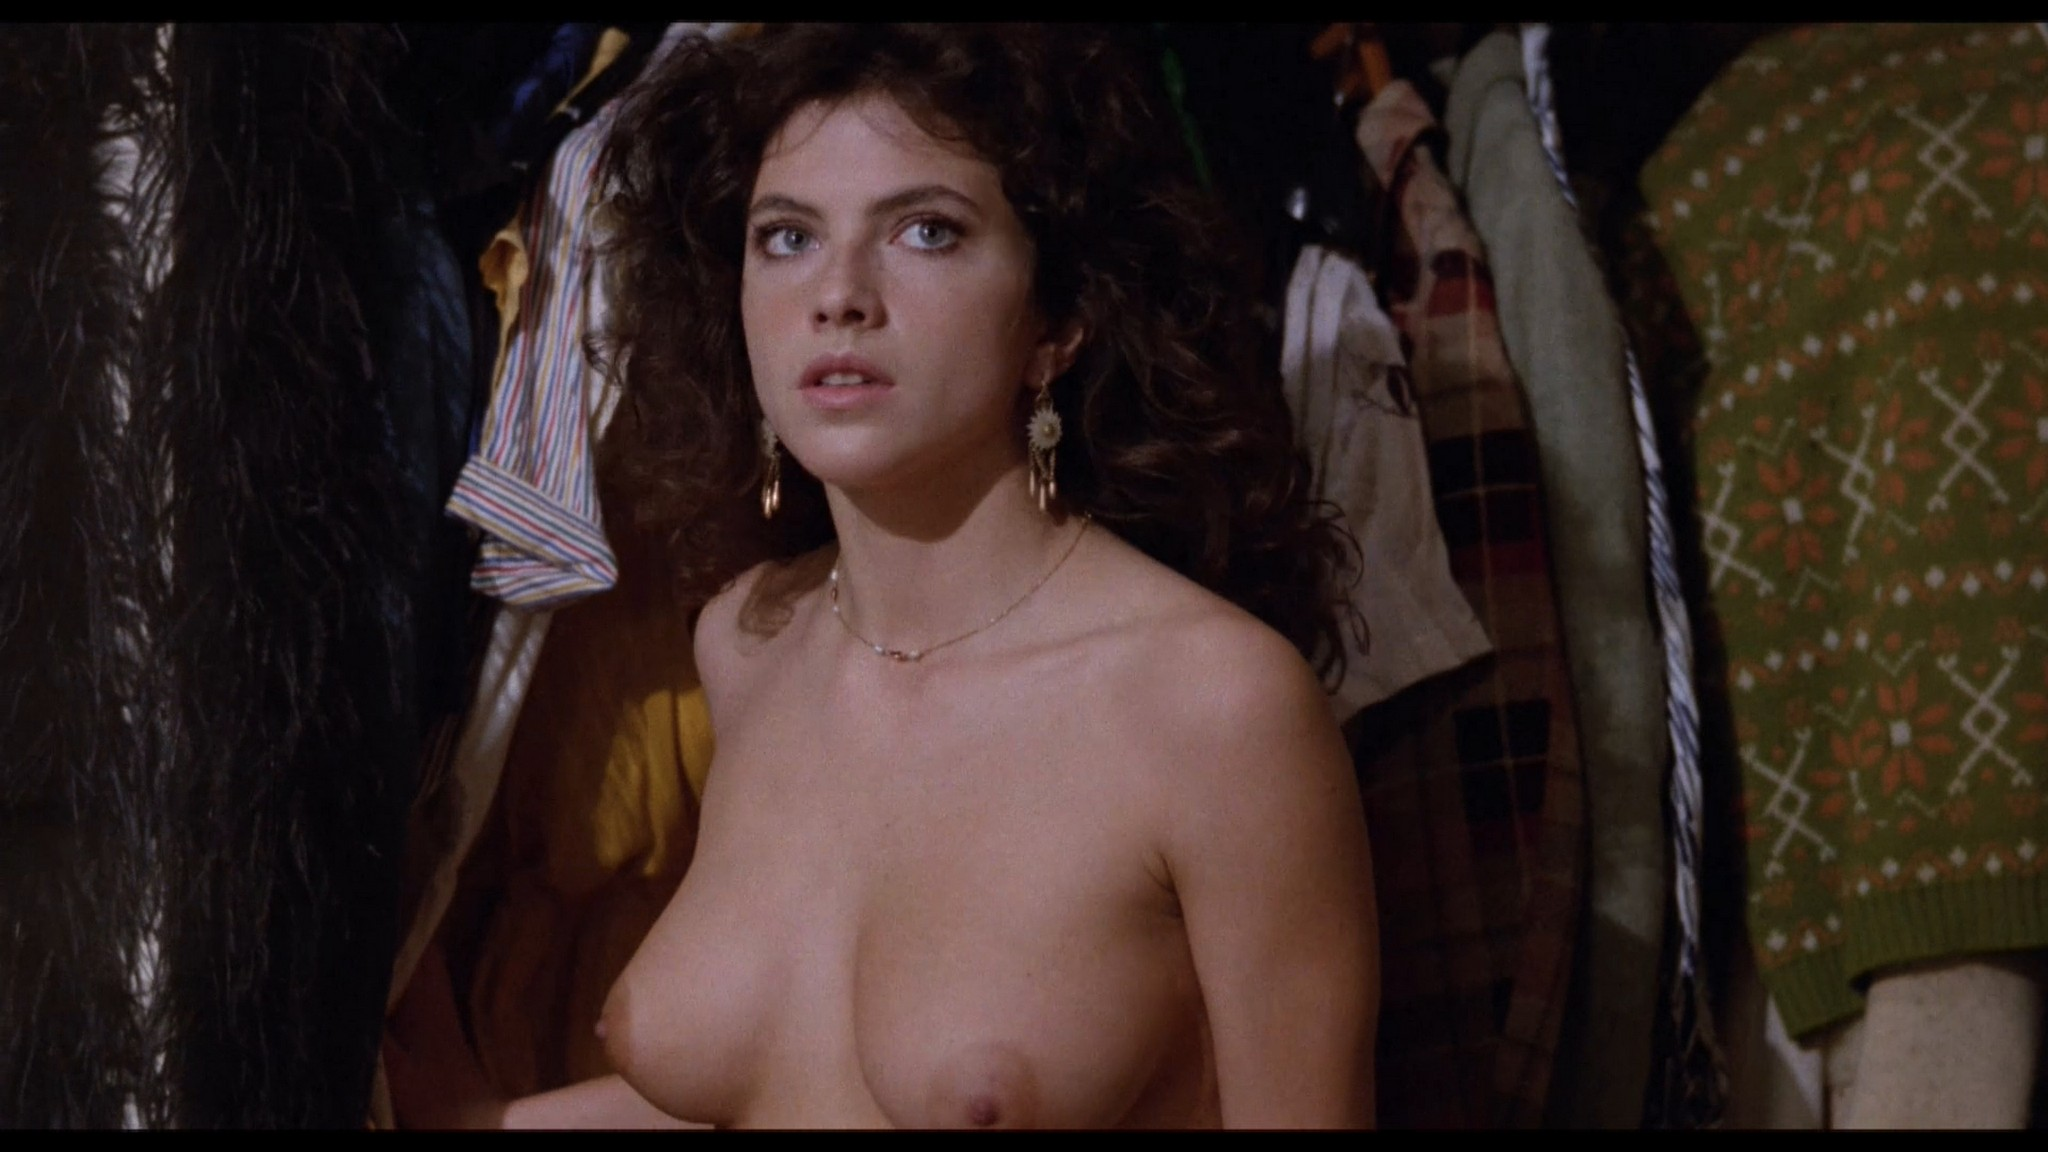 Donatella Damiani Nude Pics, Page